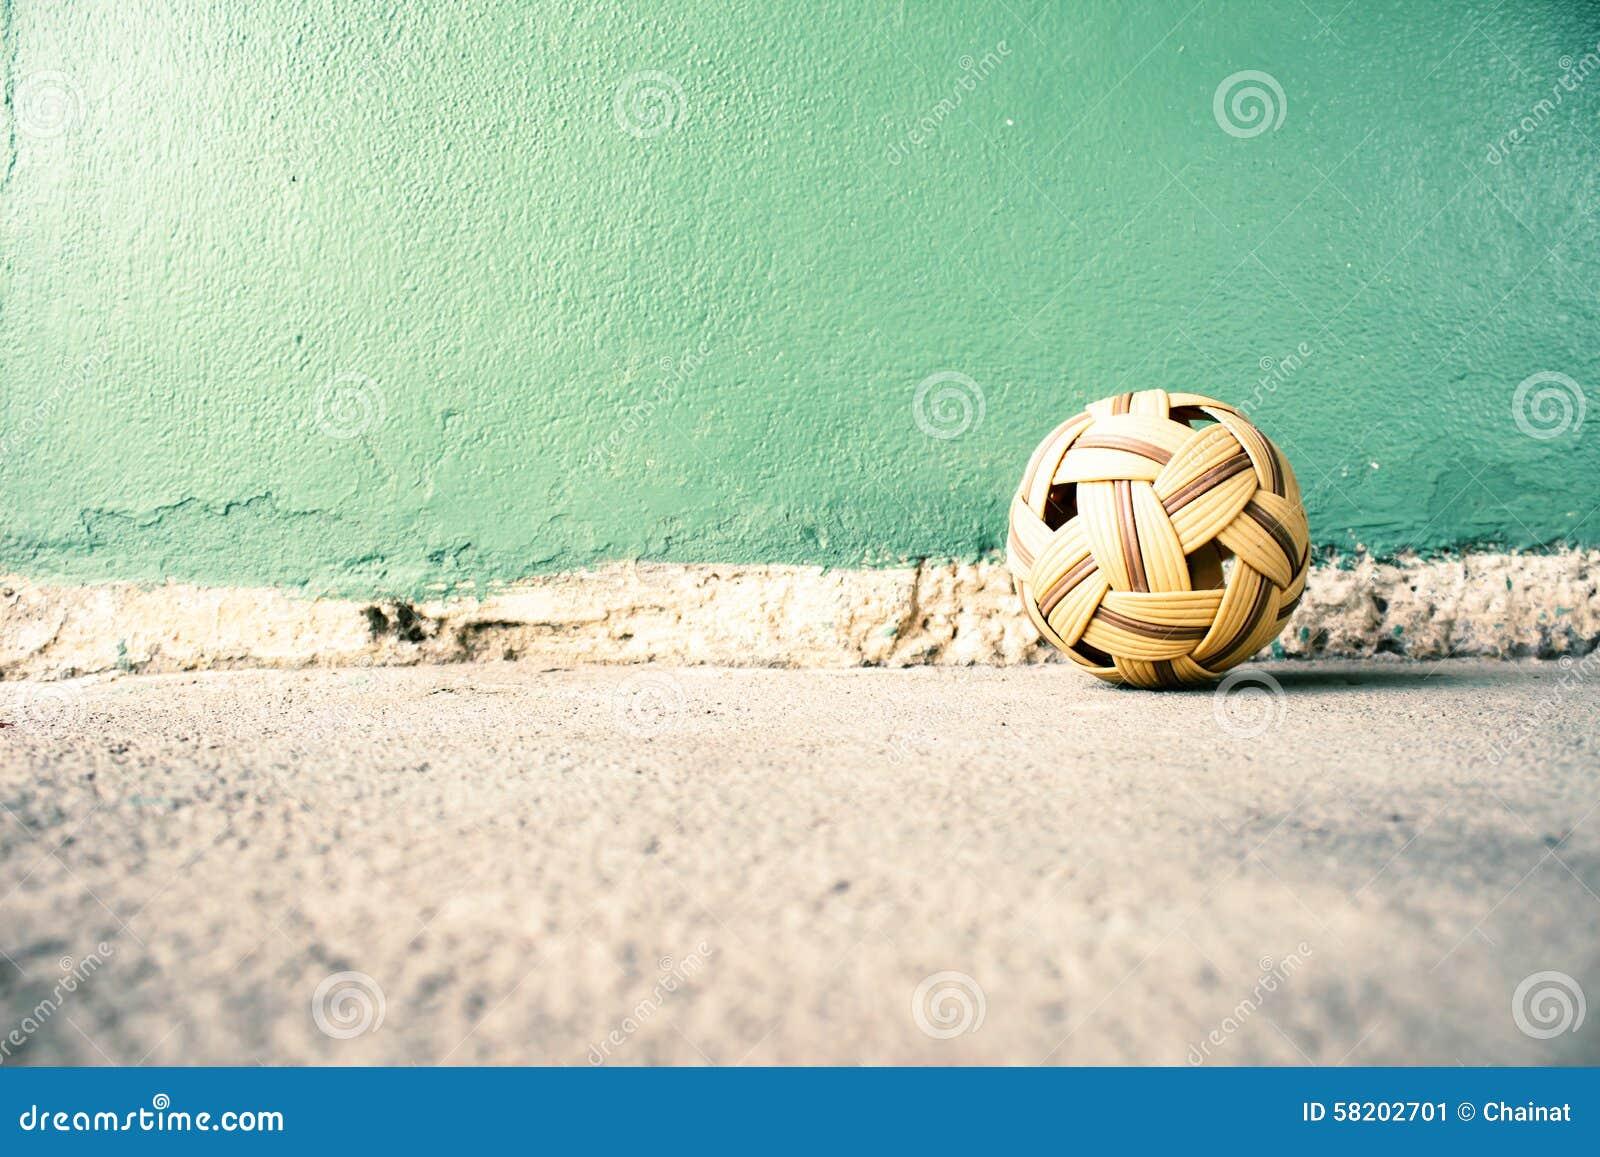 sepak takraw desktop wallpaper - photo #23